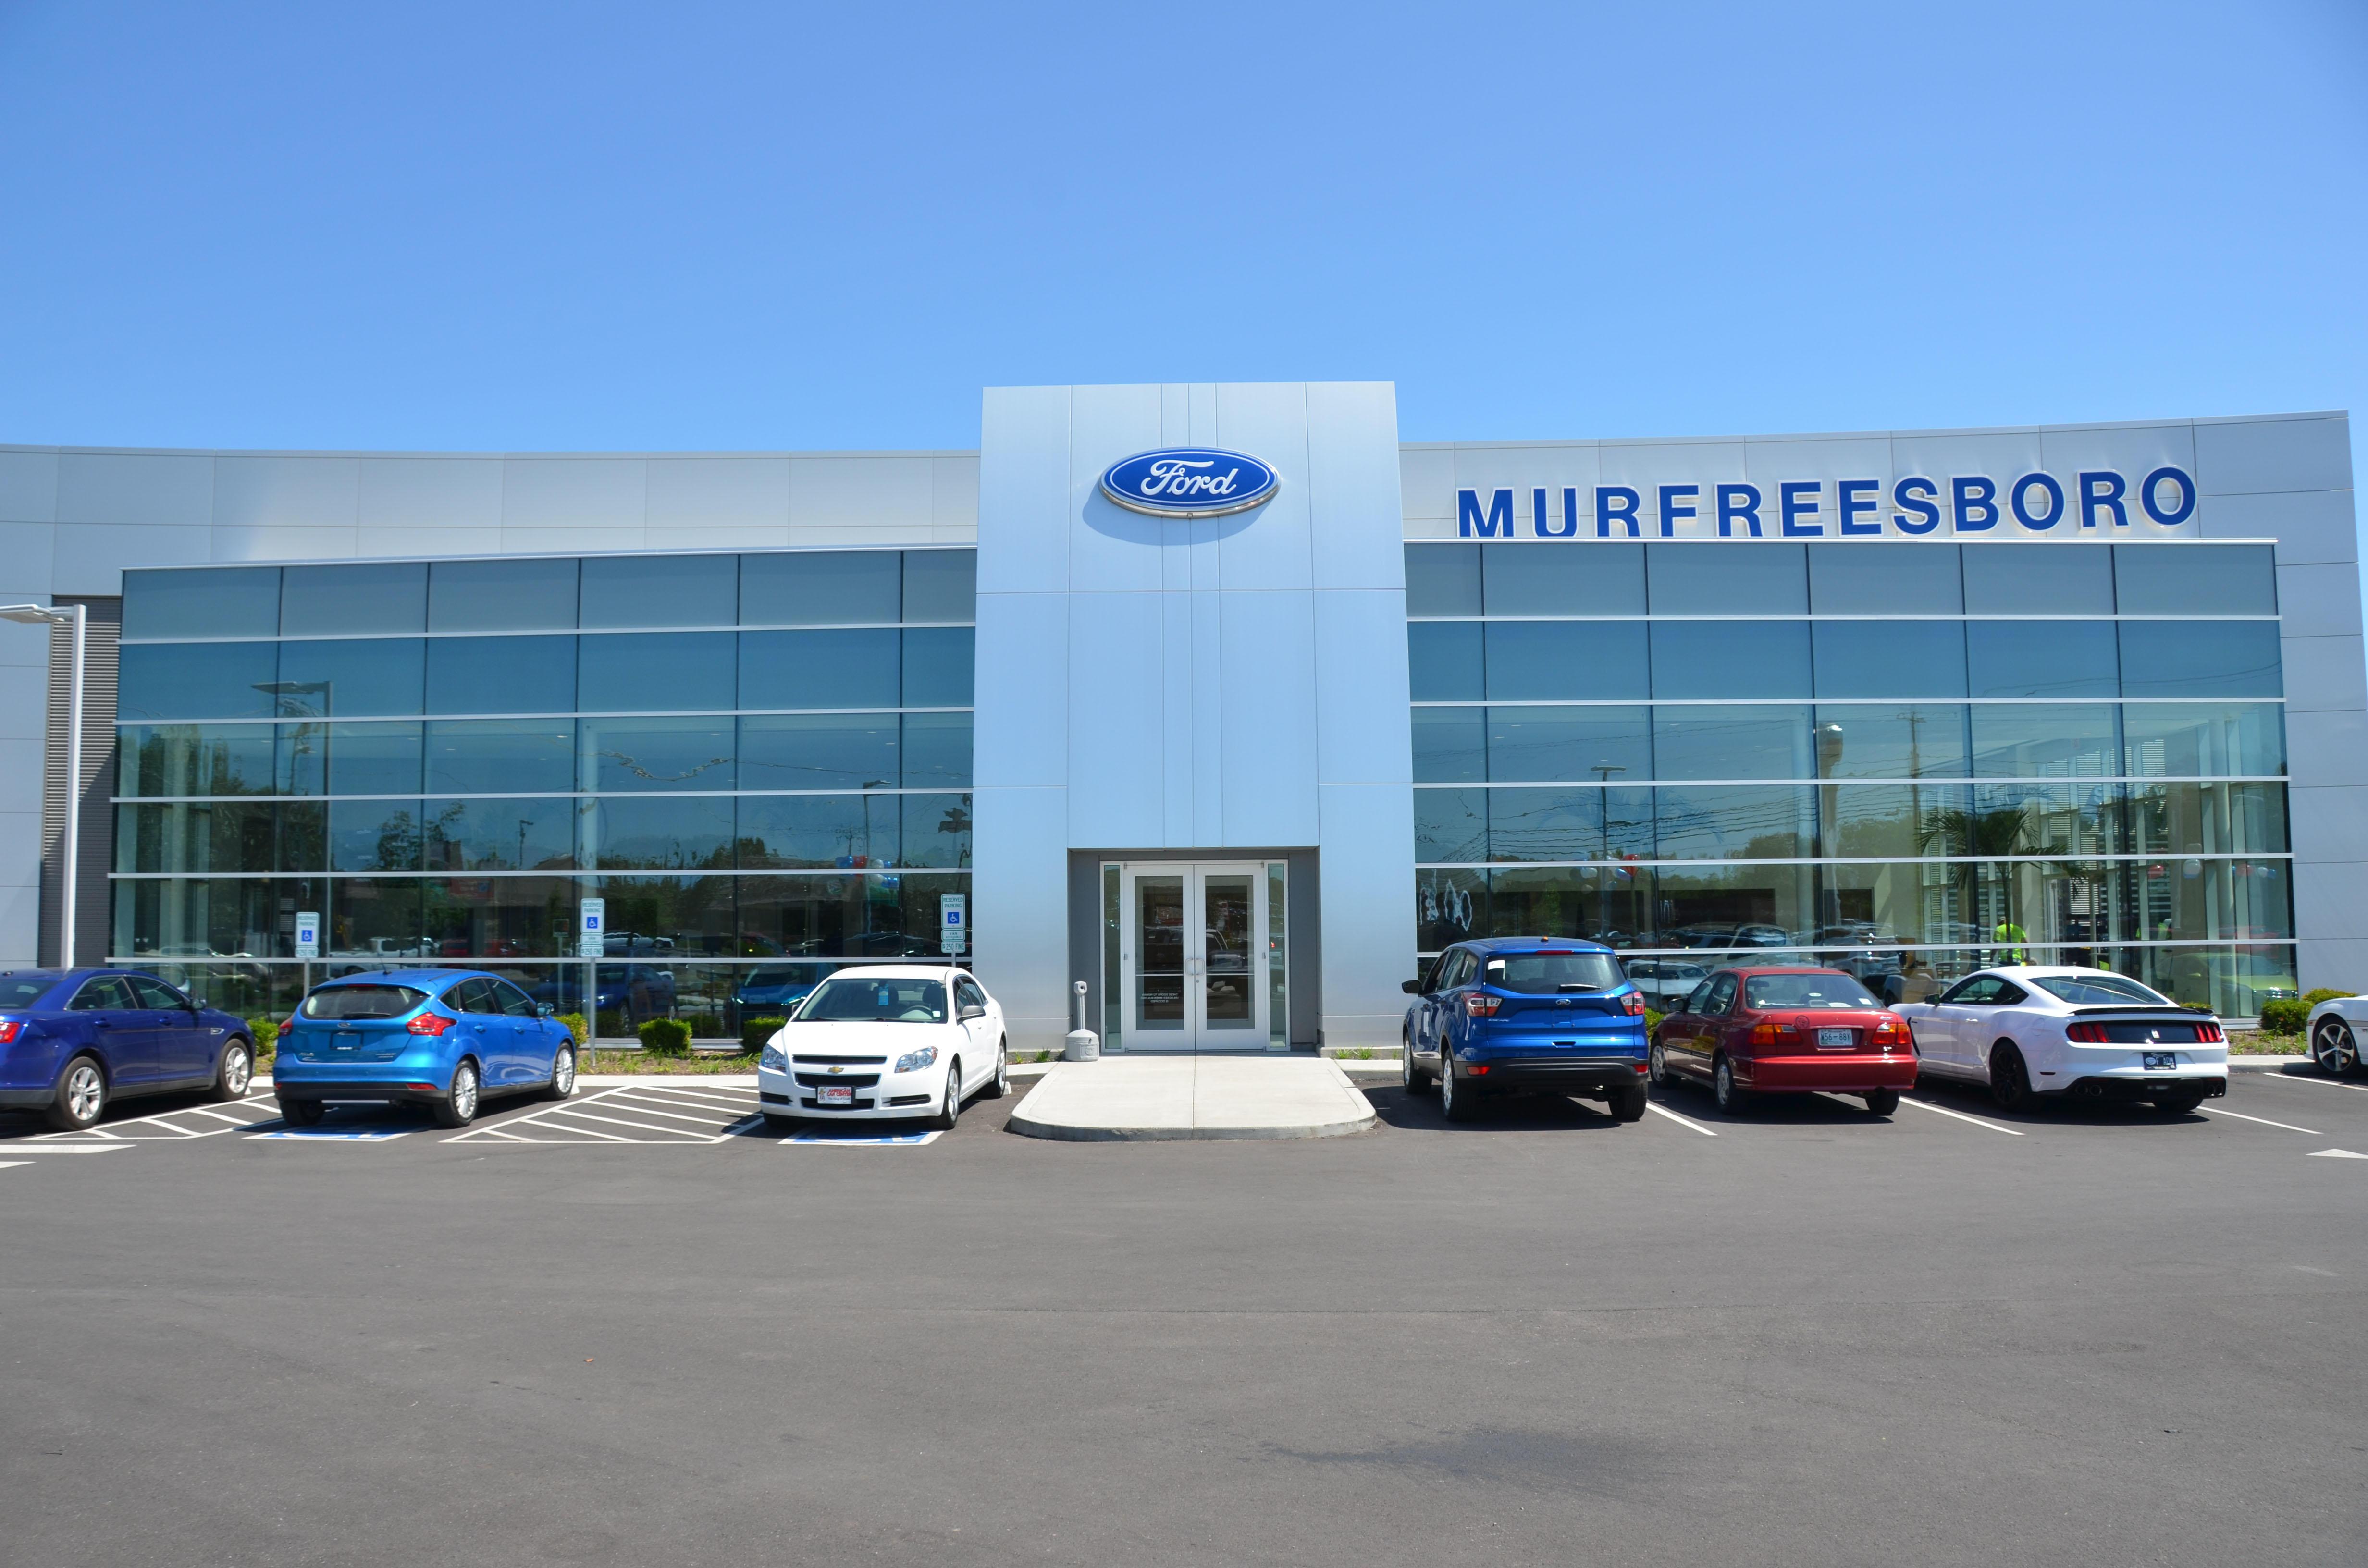 Ford of Murfreesboro 14 N.W. Broad Street Murfreesboro, TN ...   ford of murfreesboro